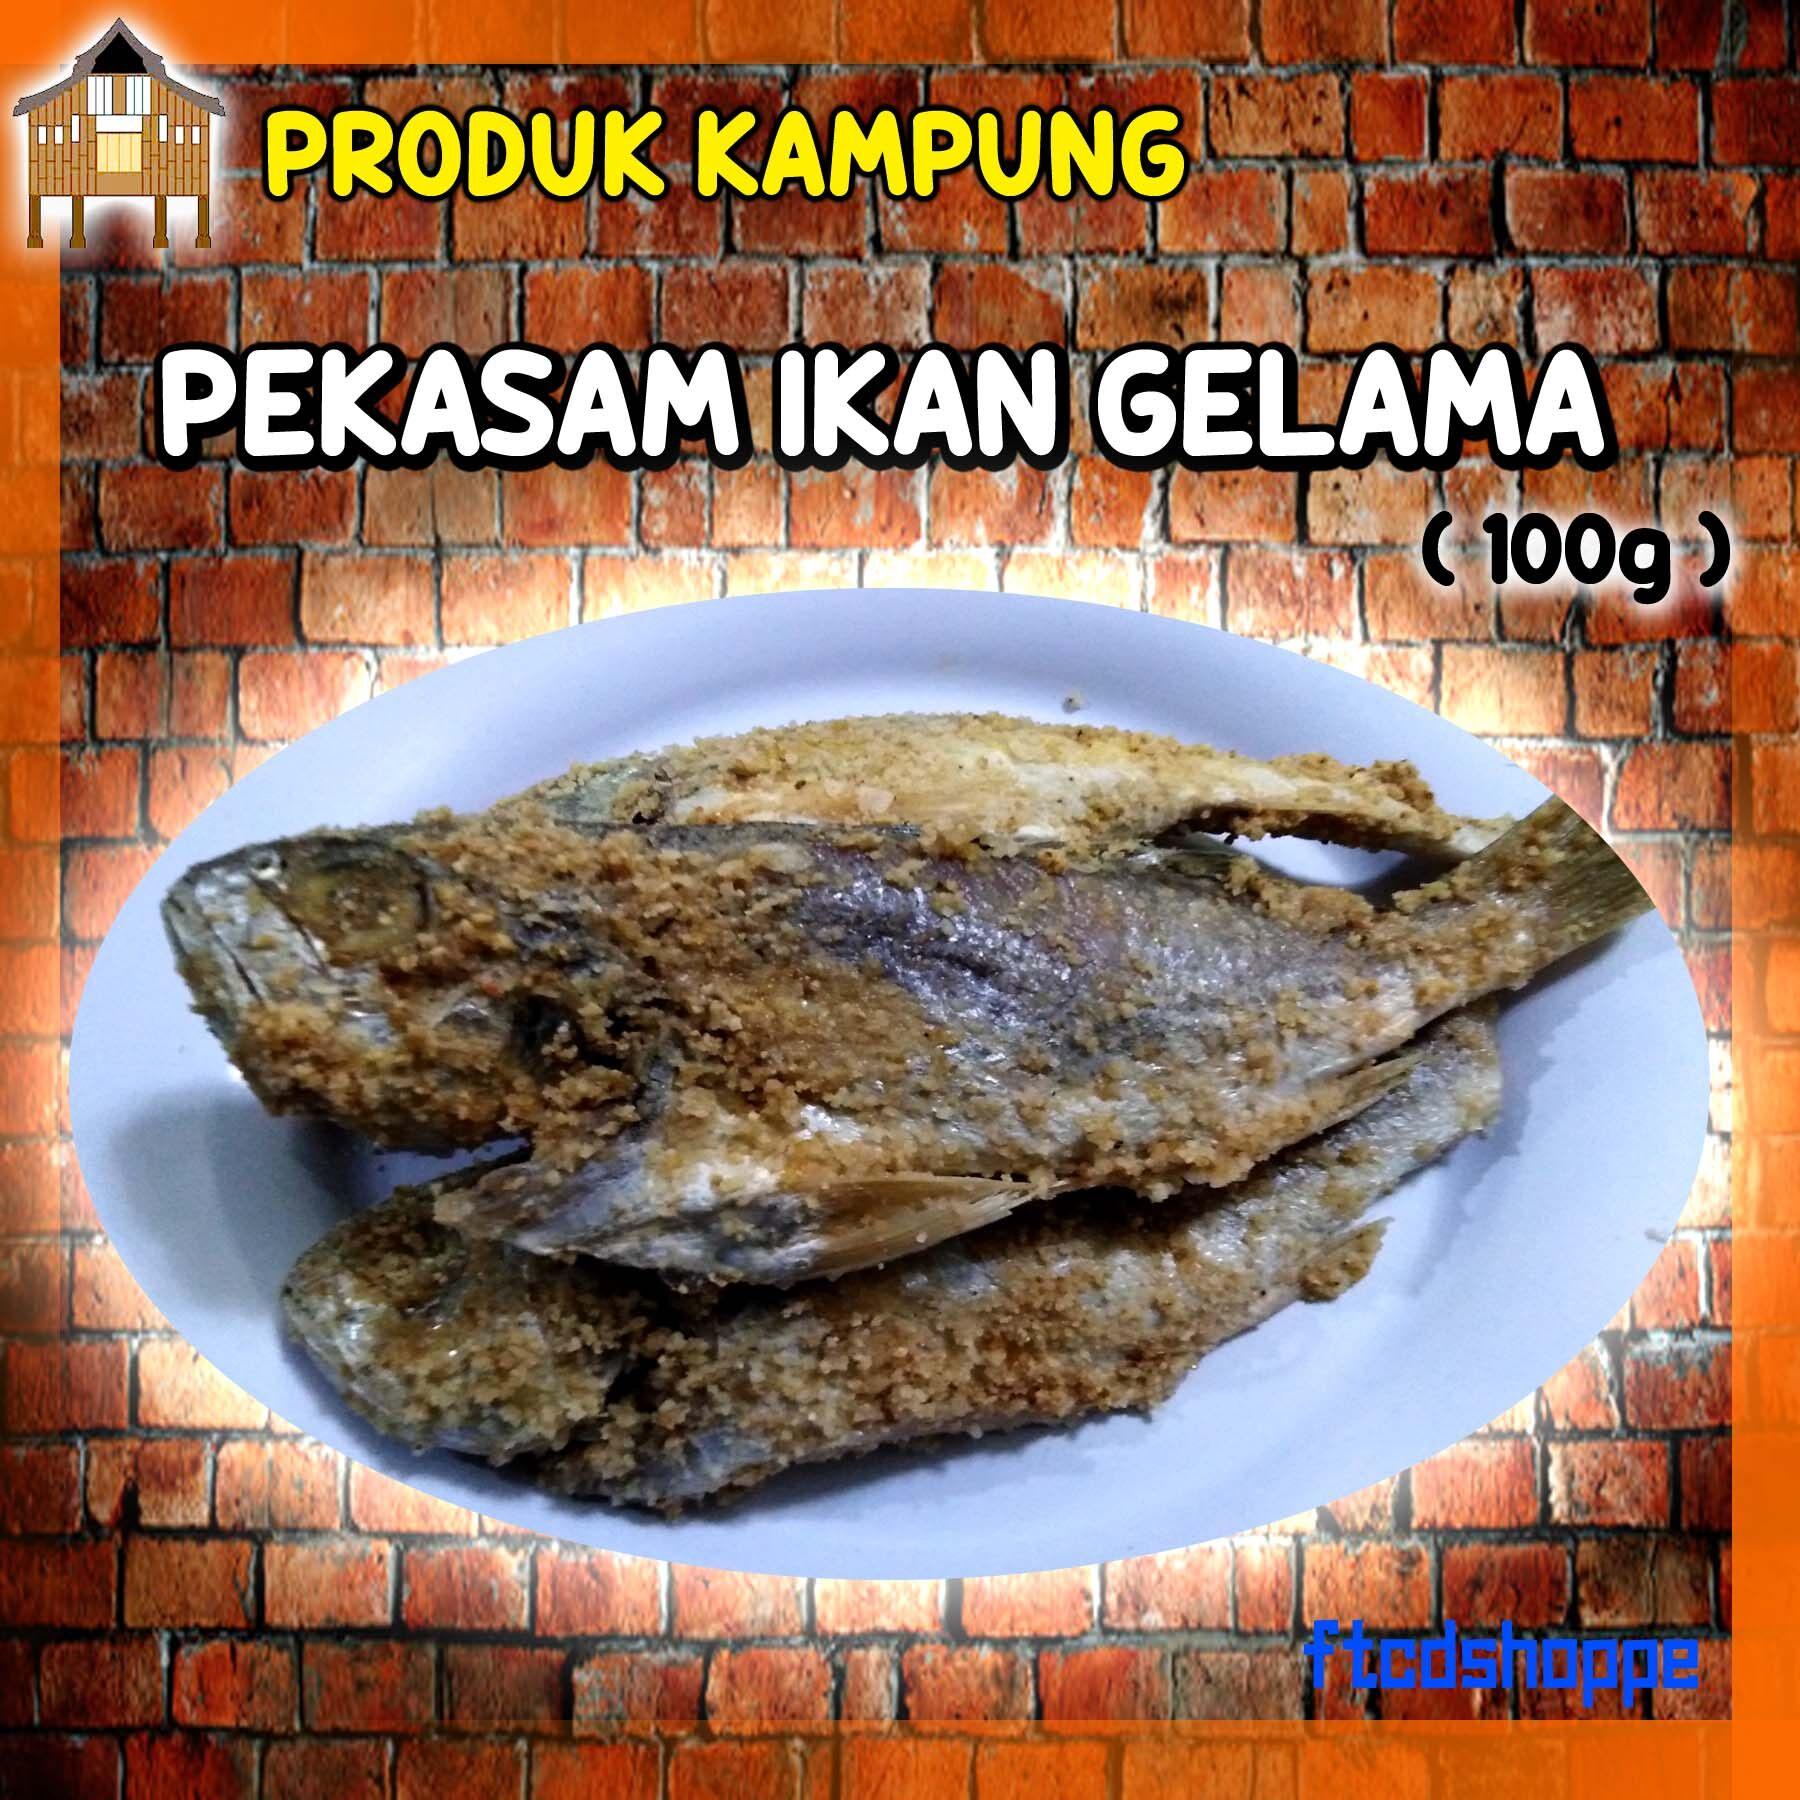 PRODUK KAMPUNG - Pekasam Ikan Gelama ( 100g )